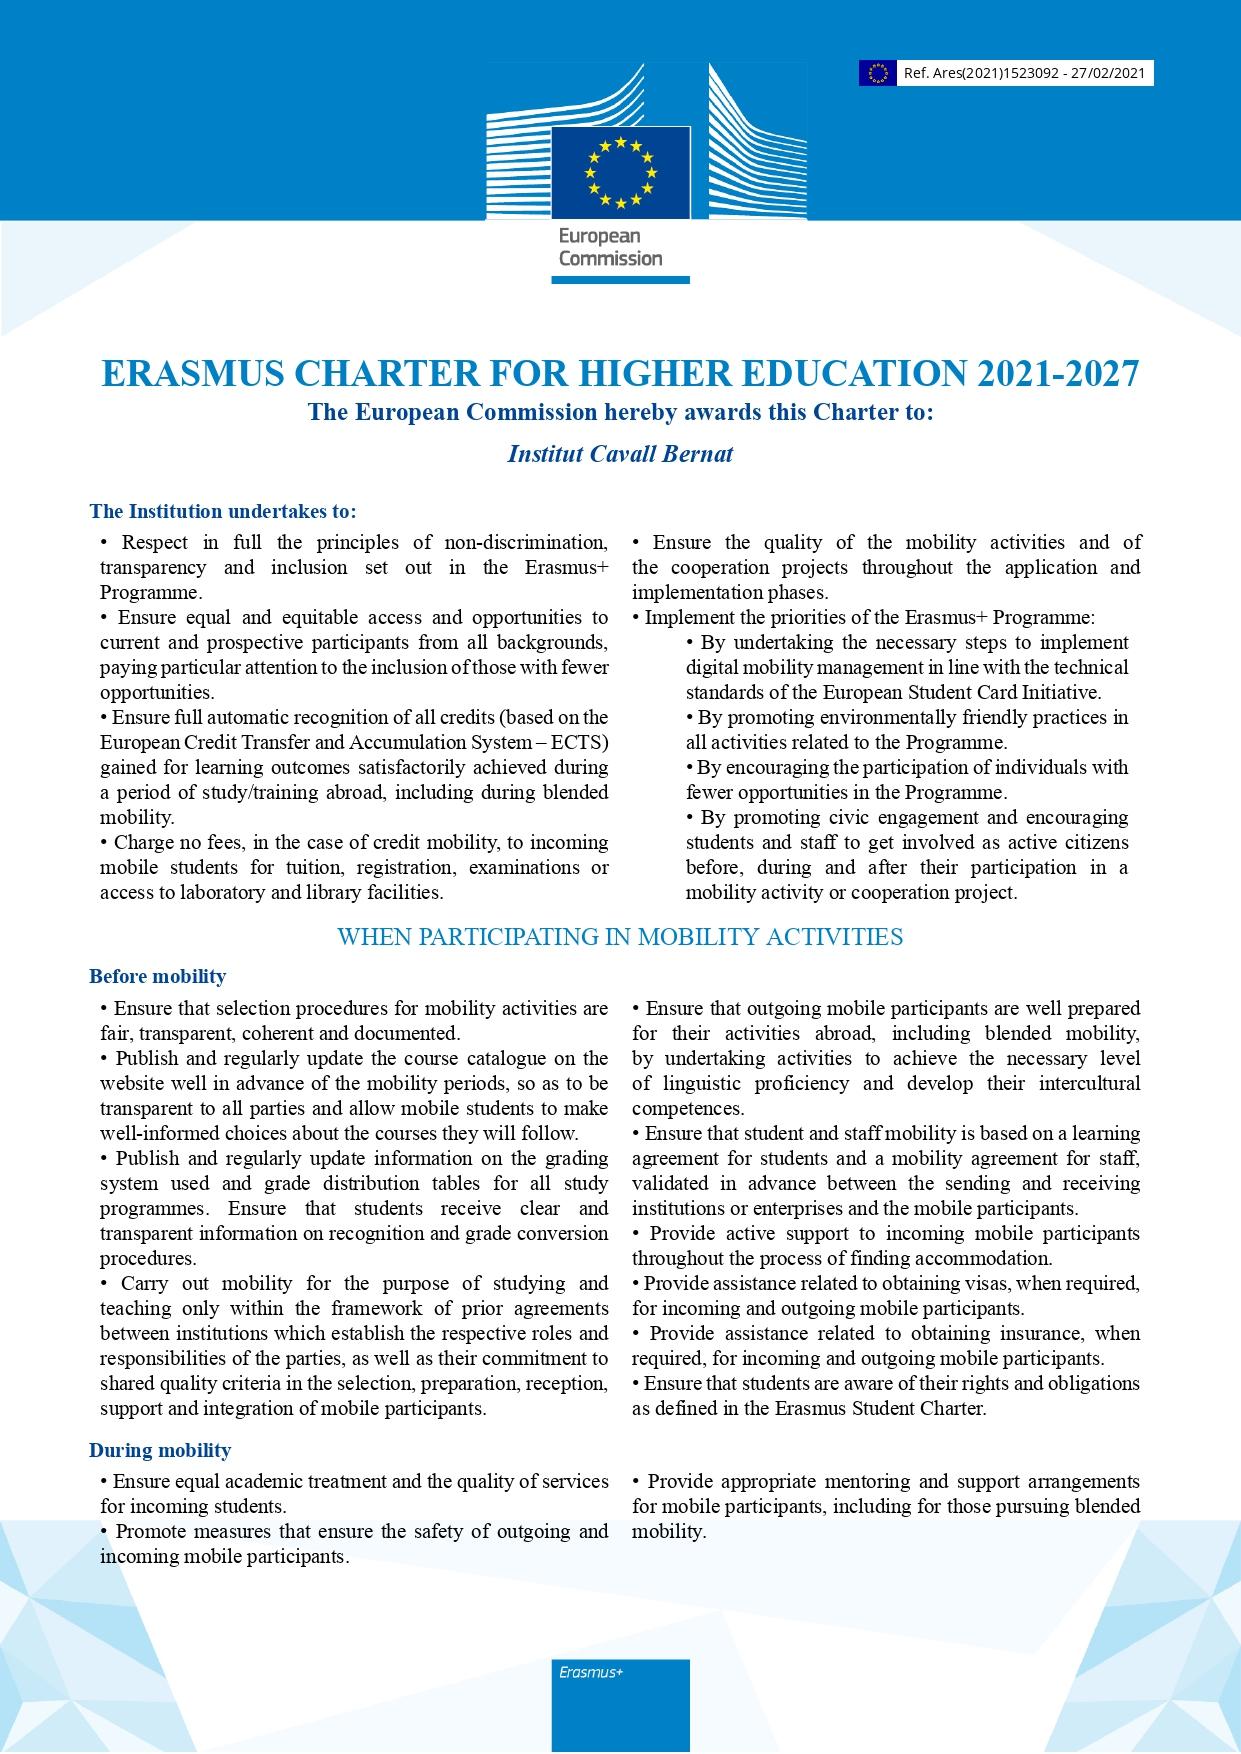 Erasmus Charter ehtv 2021